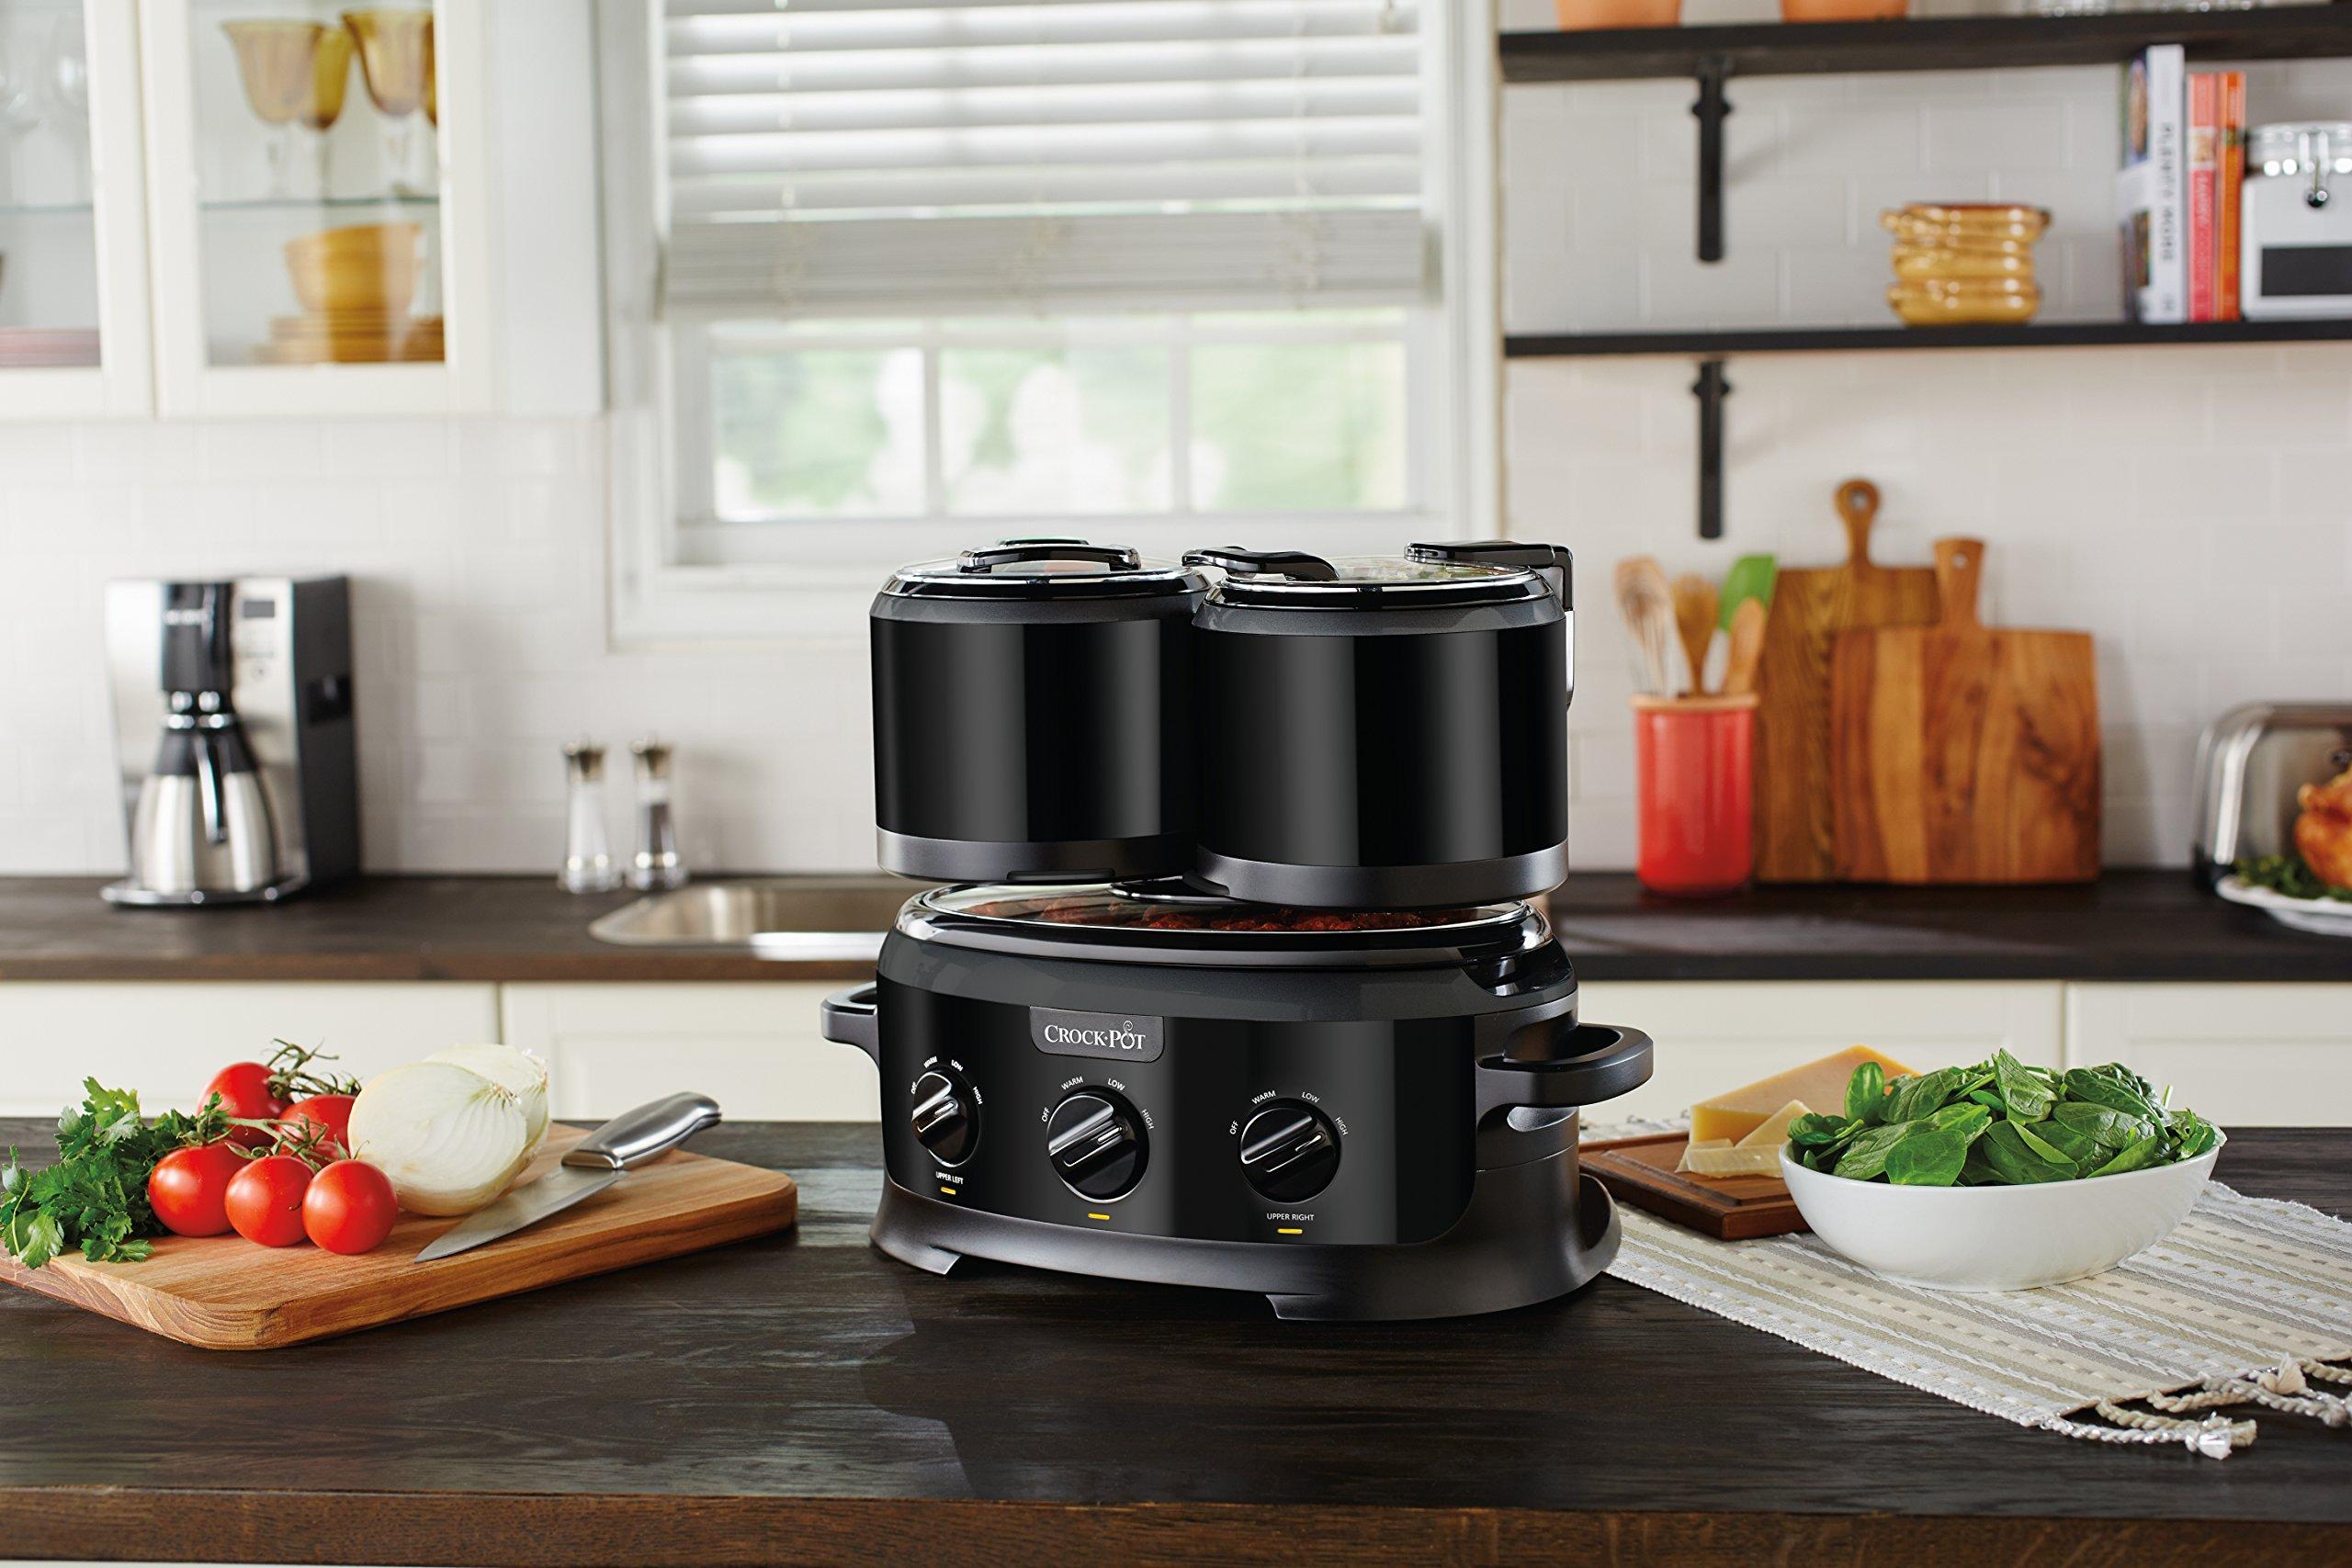 Crock-pot SCCPTOWER-B Swing and Serve Slow Cooker, Black by Crock-Pot (Image #4)